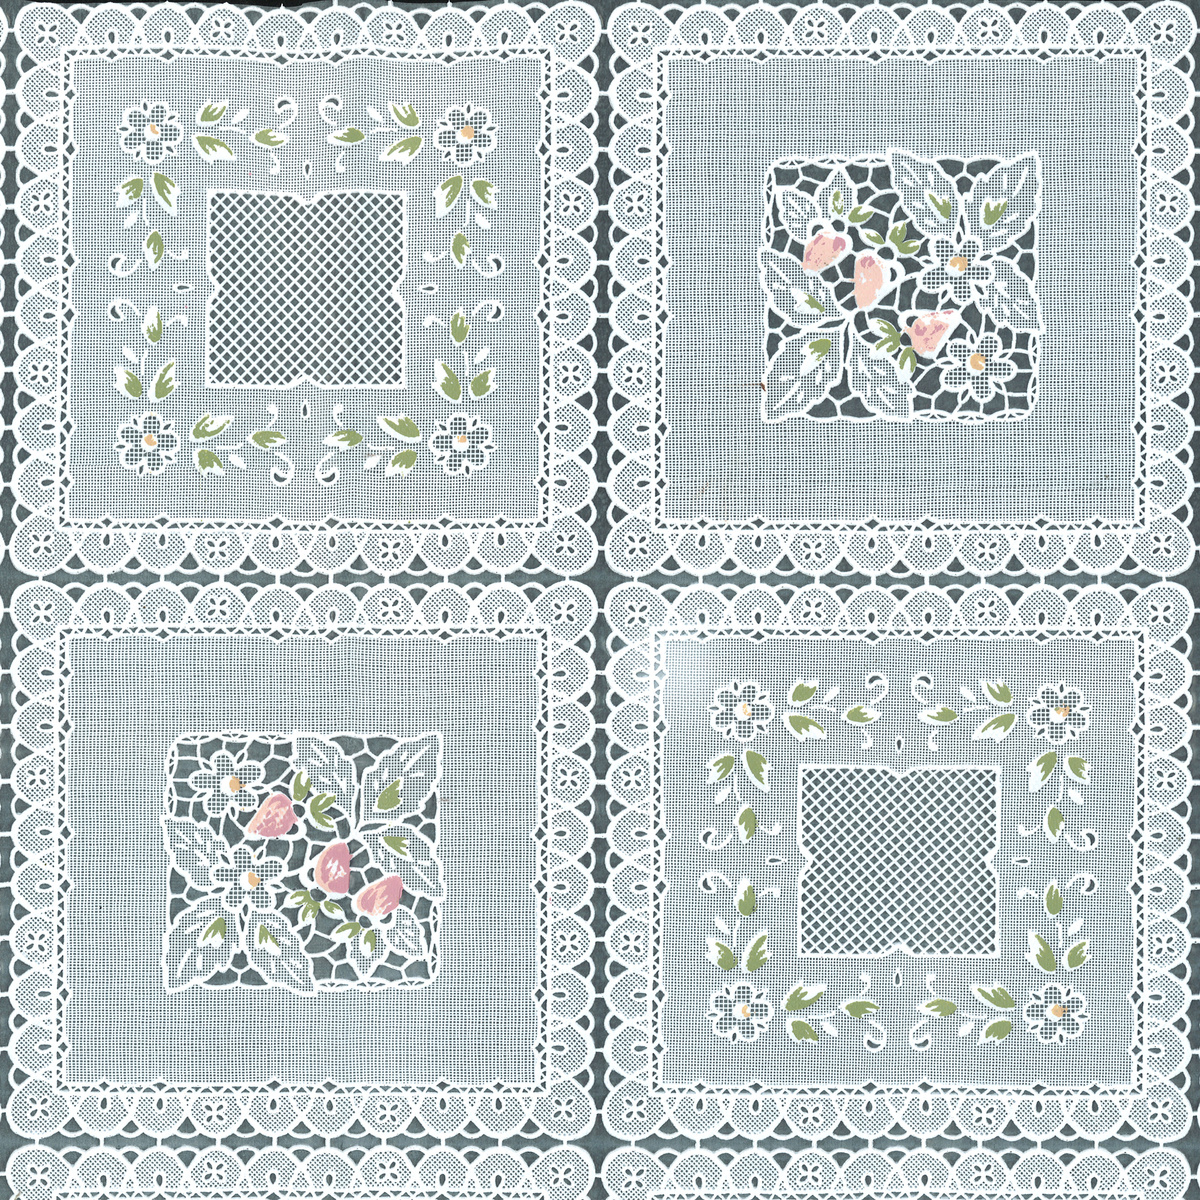 Tablecloth Vinyl Squares Floral Joann